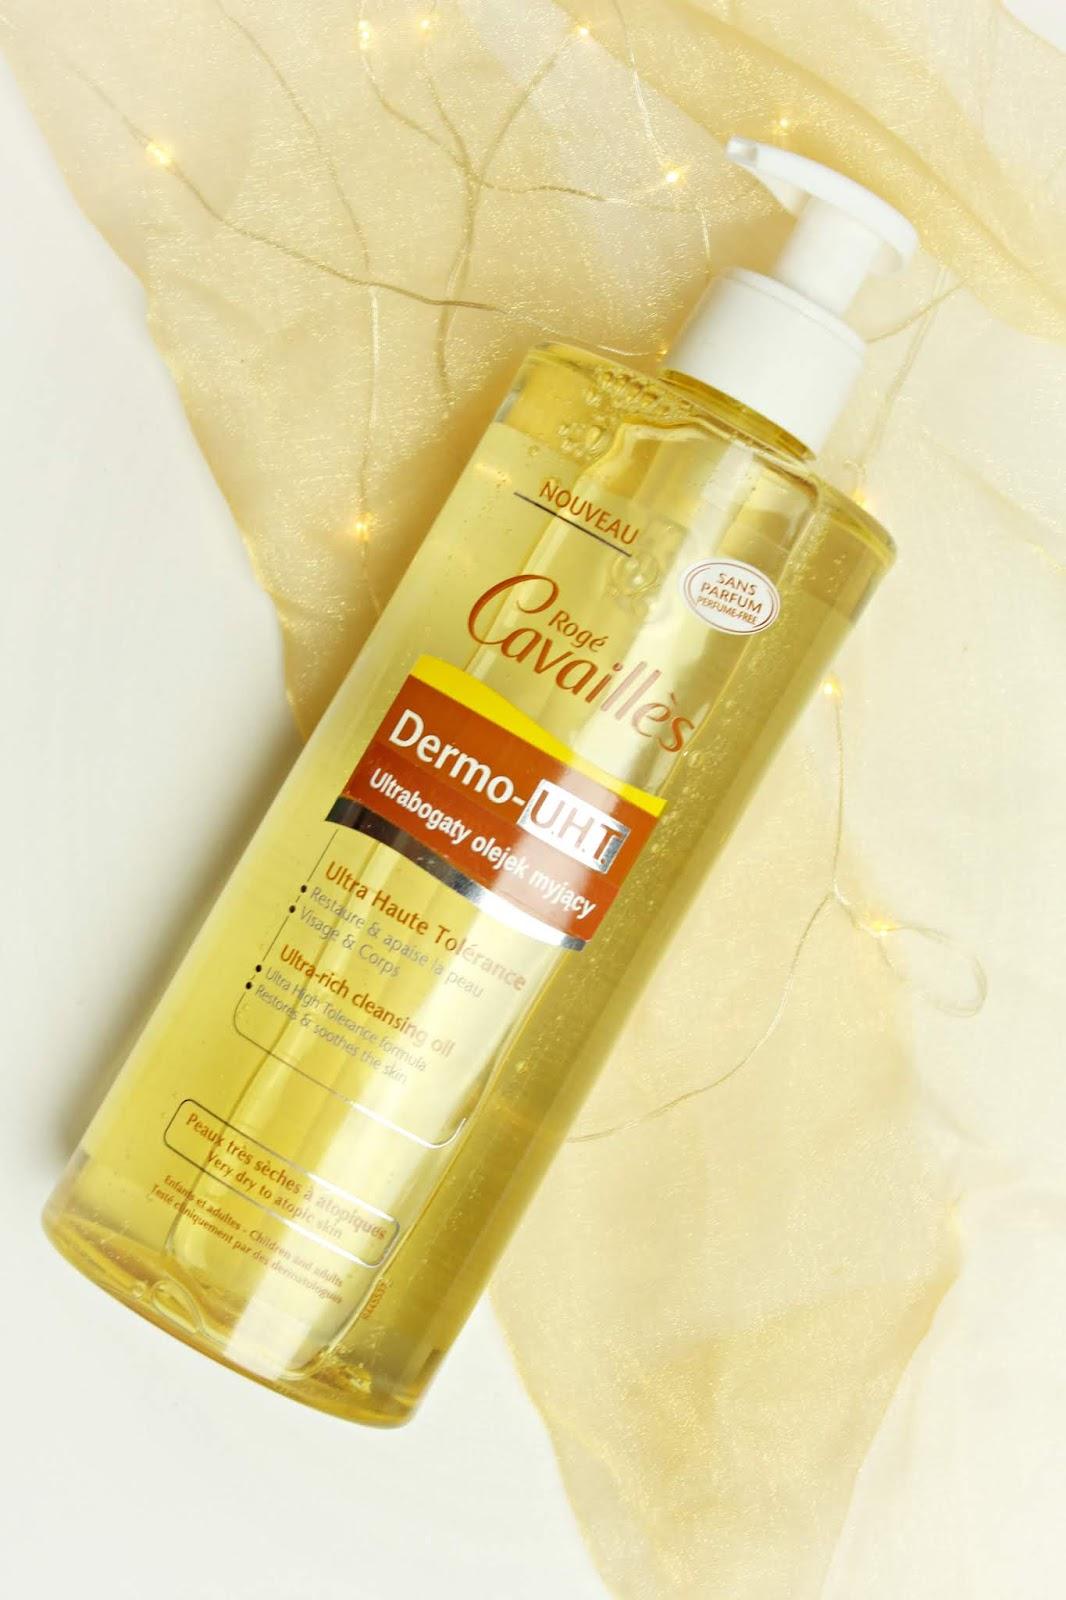 Olejek myjący Dermo-U.H.T roge cavailles